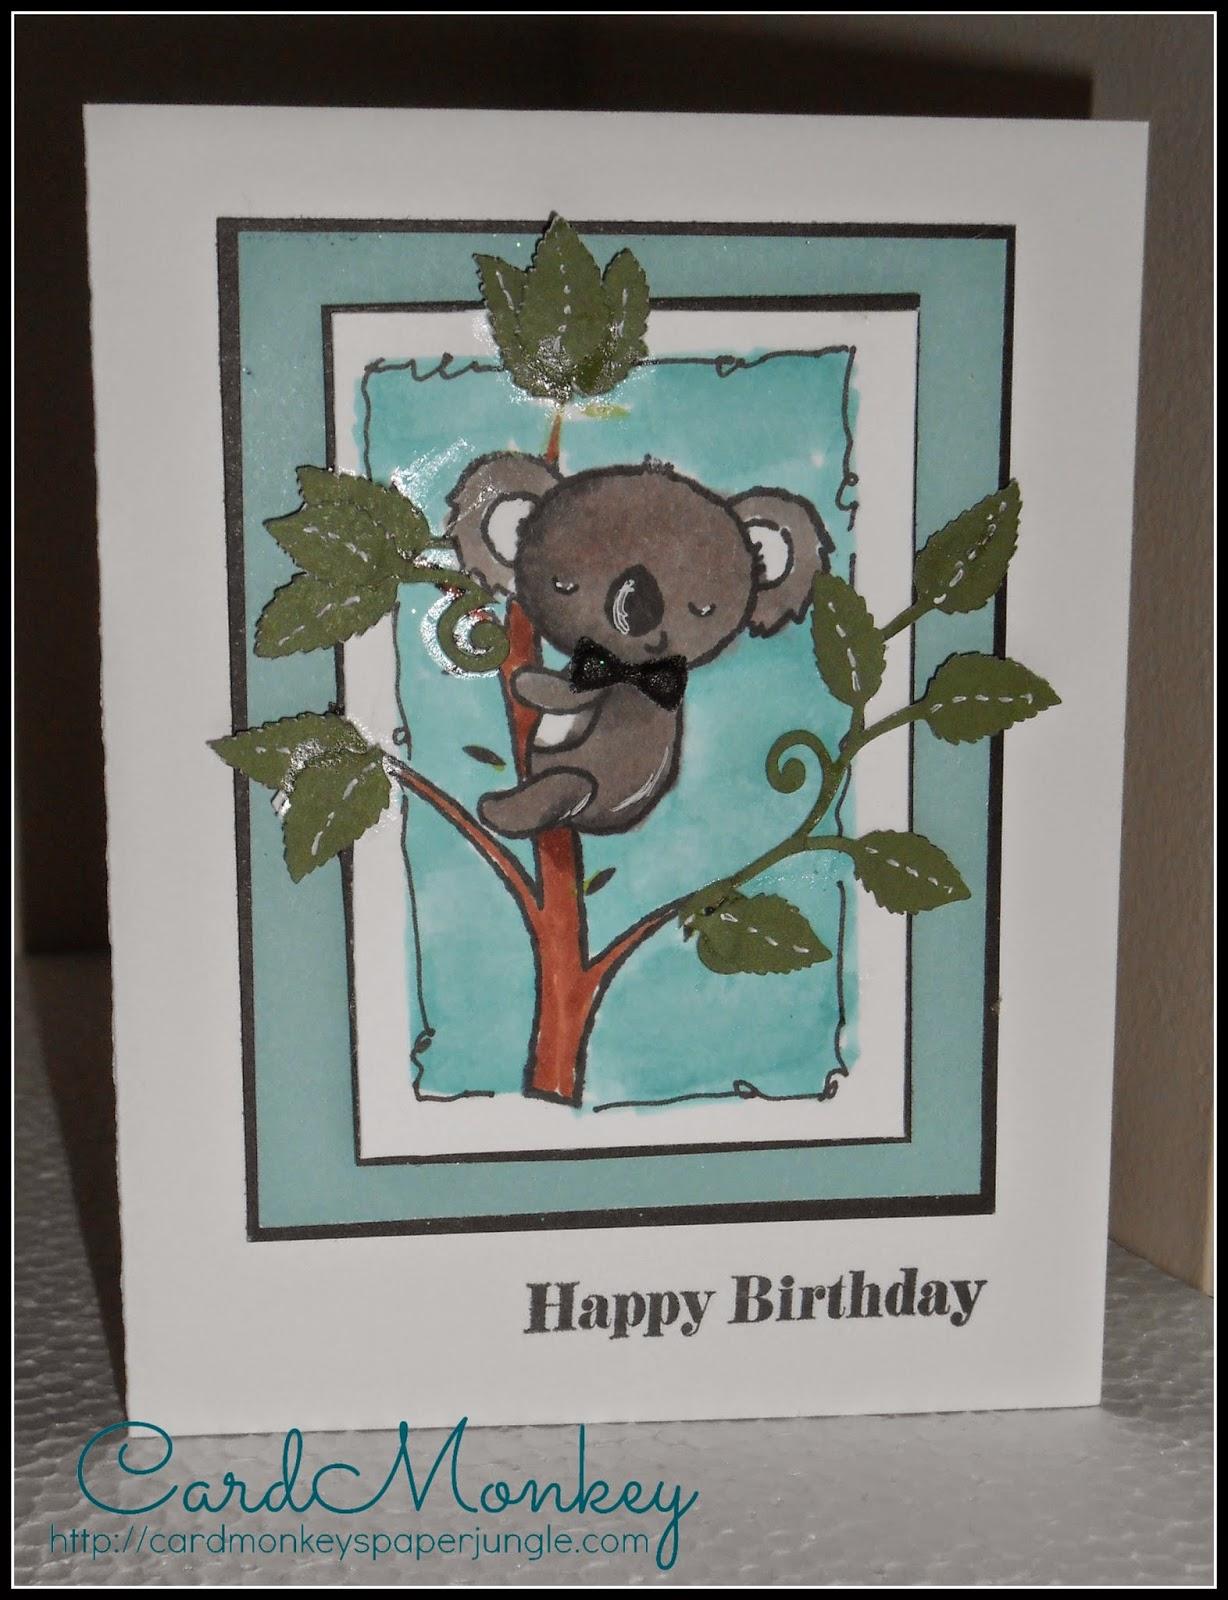 Cardmonkeys Paper Jungle Birthday Cute Koala Card